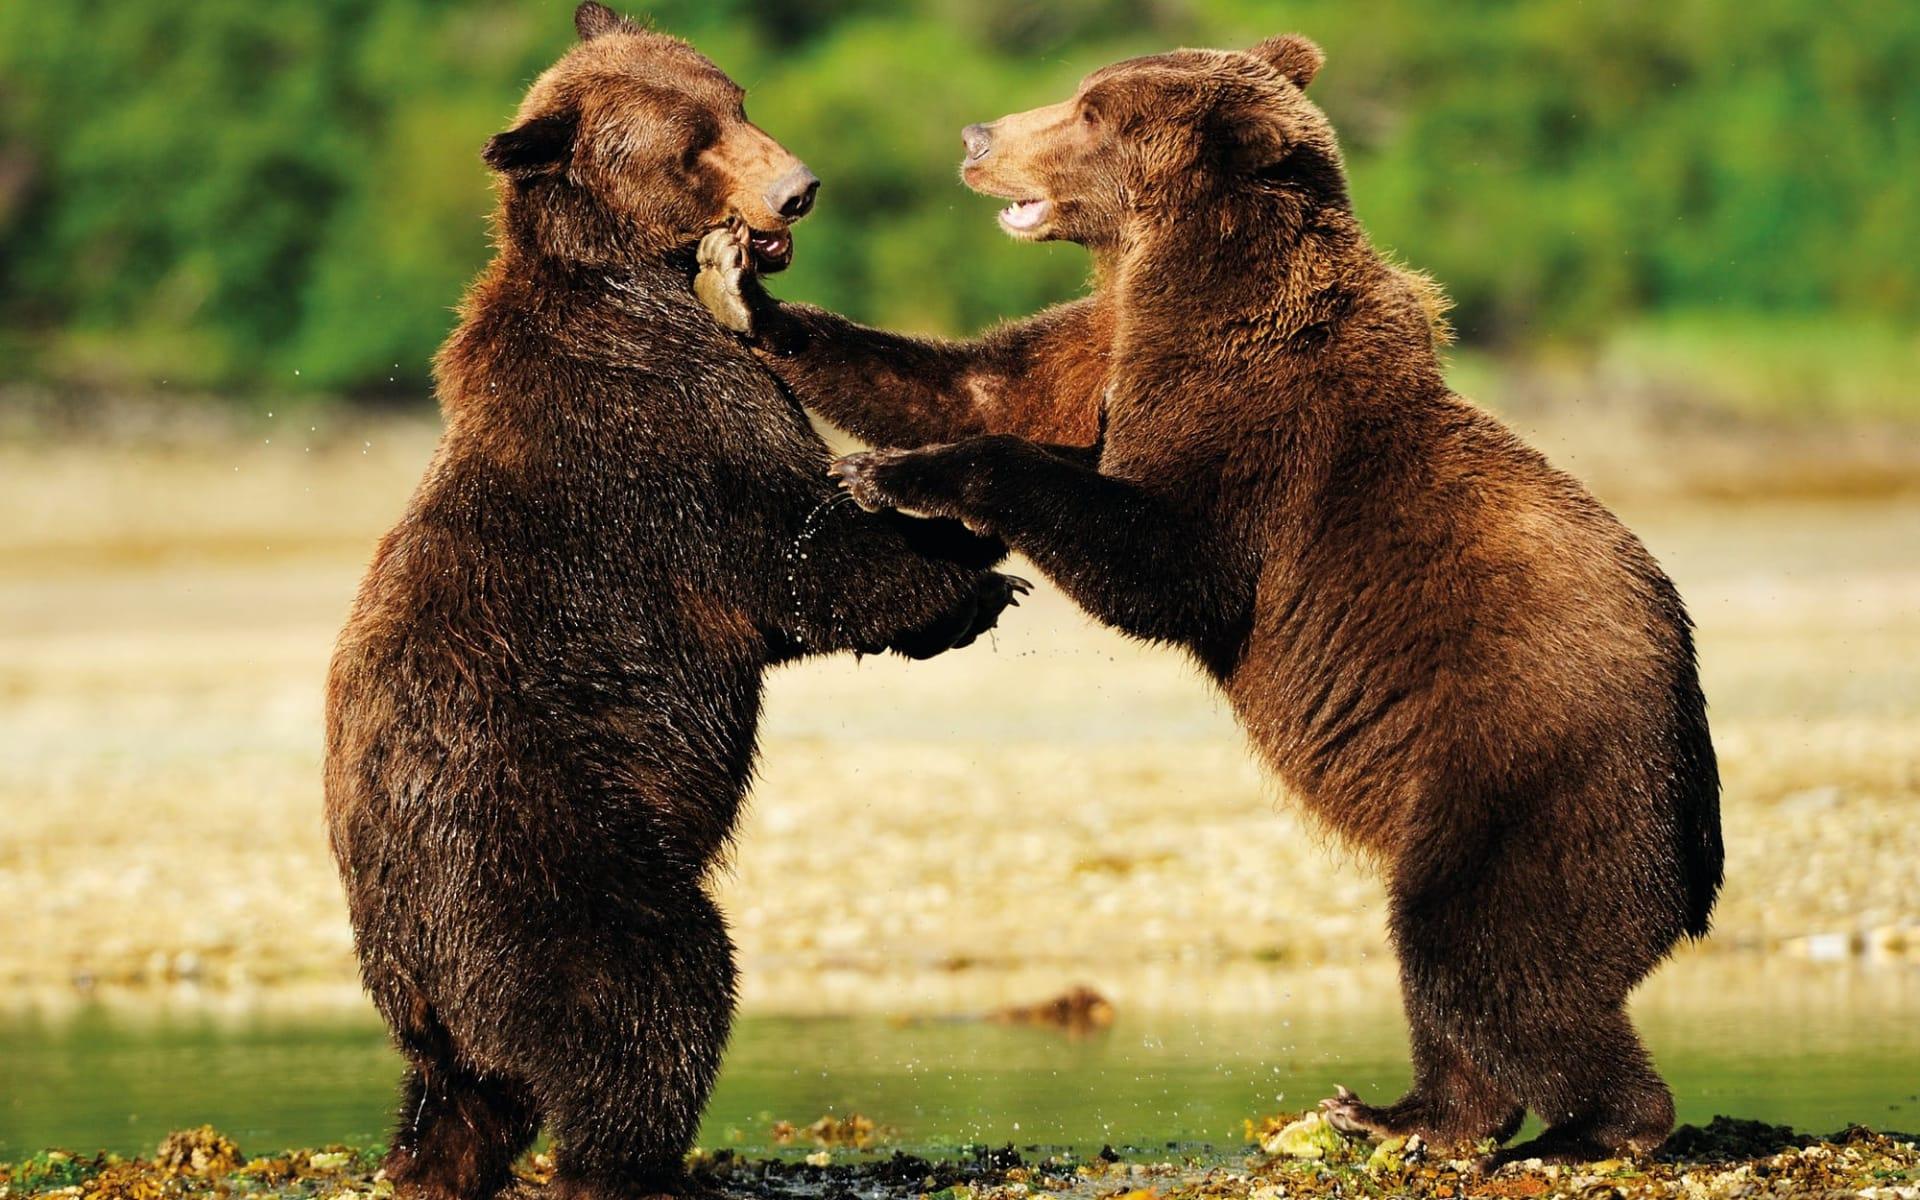 Bärenbeobachtung Redoubt Bay Lodge 2 Tage ab Anchorage: Alaska - Katmai Nationalpark - Bären am Spielen